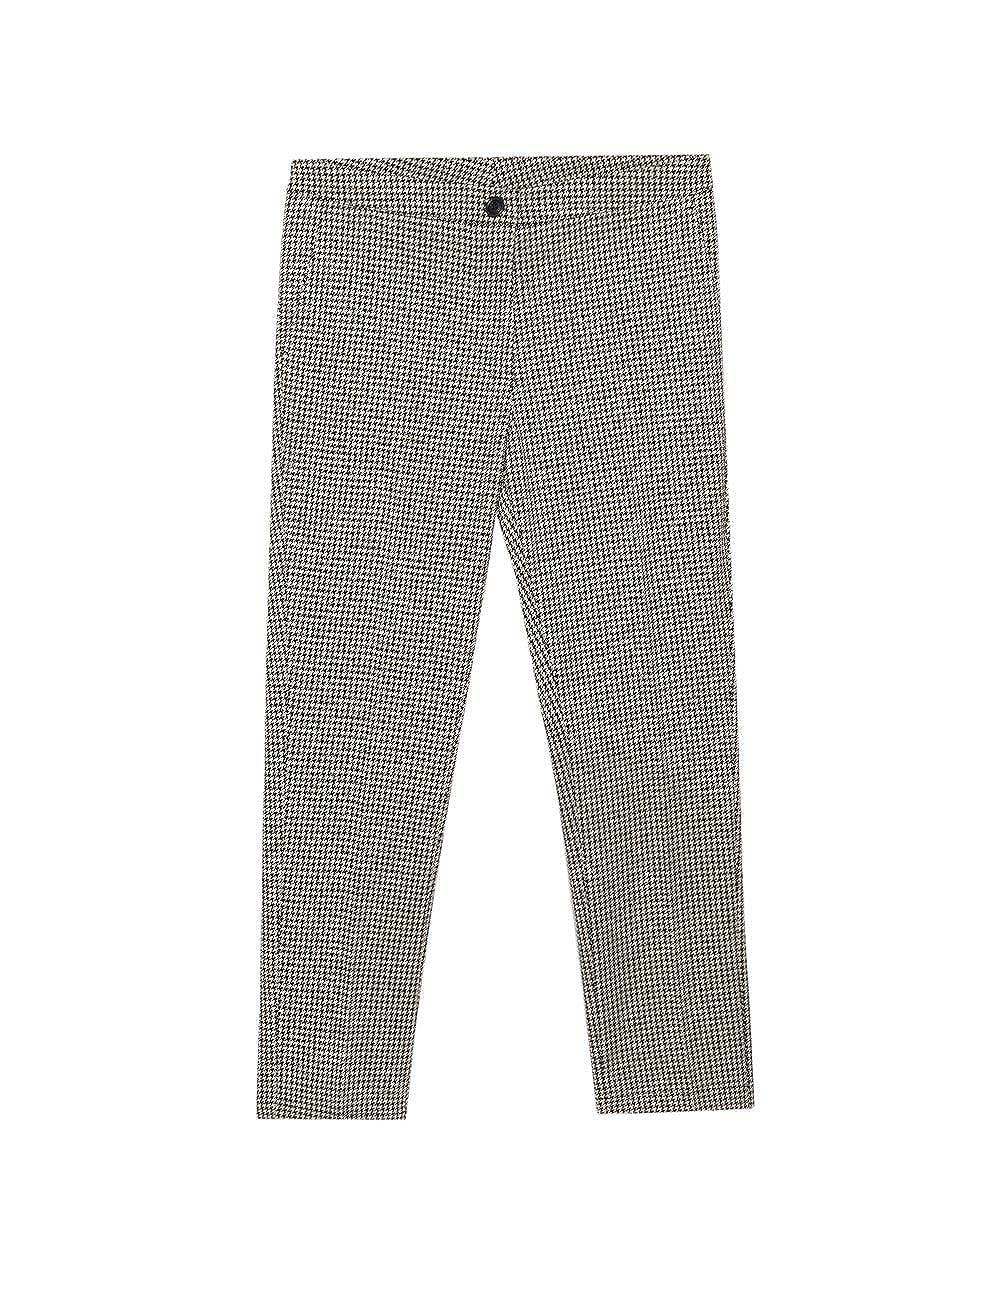 Oltre Italian Size Pantaloni Skinny Pied de Poule